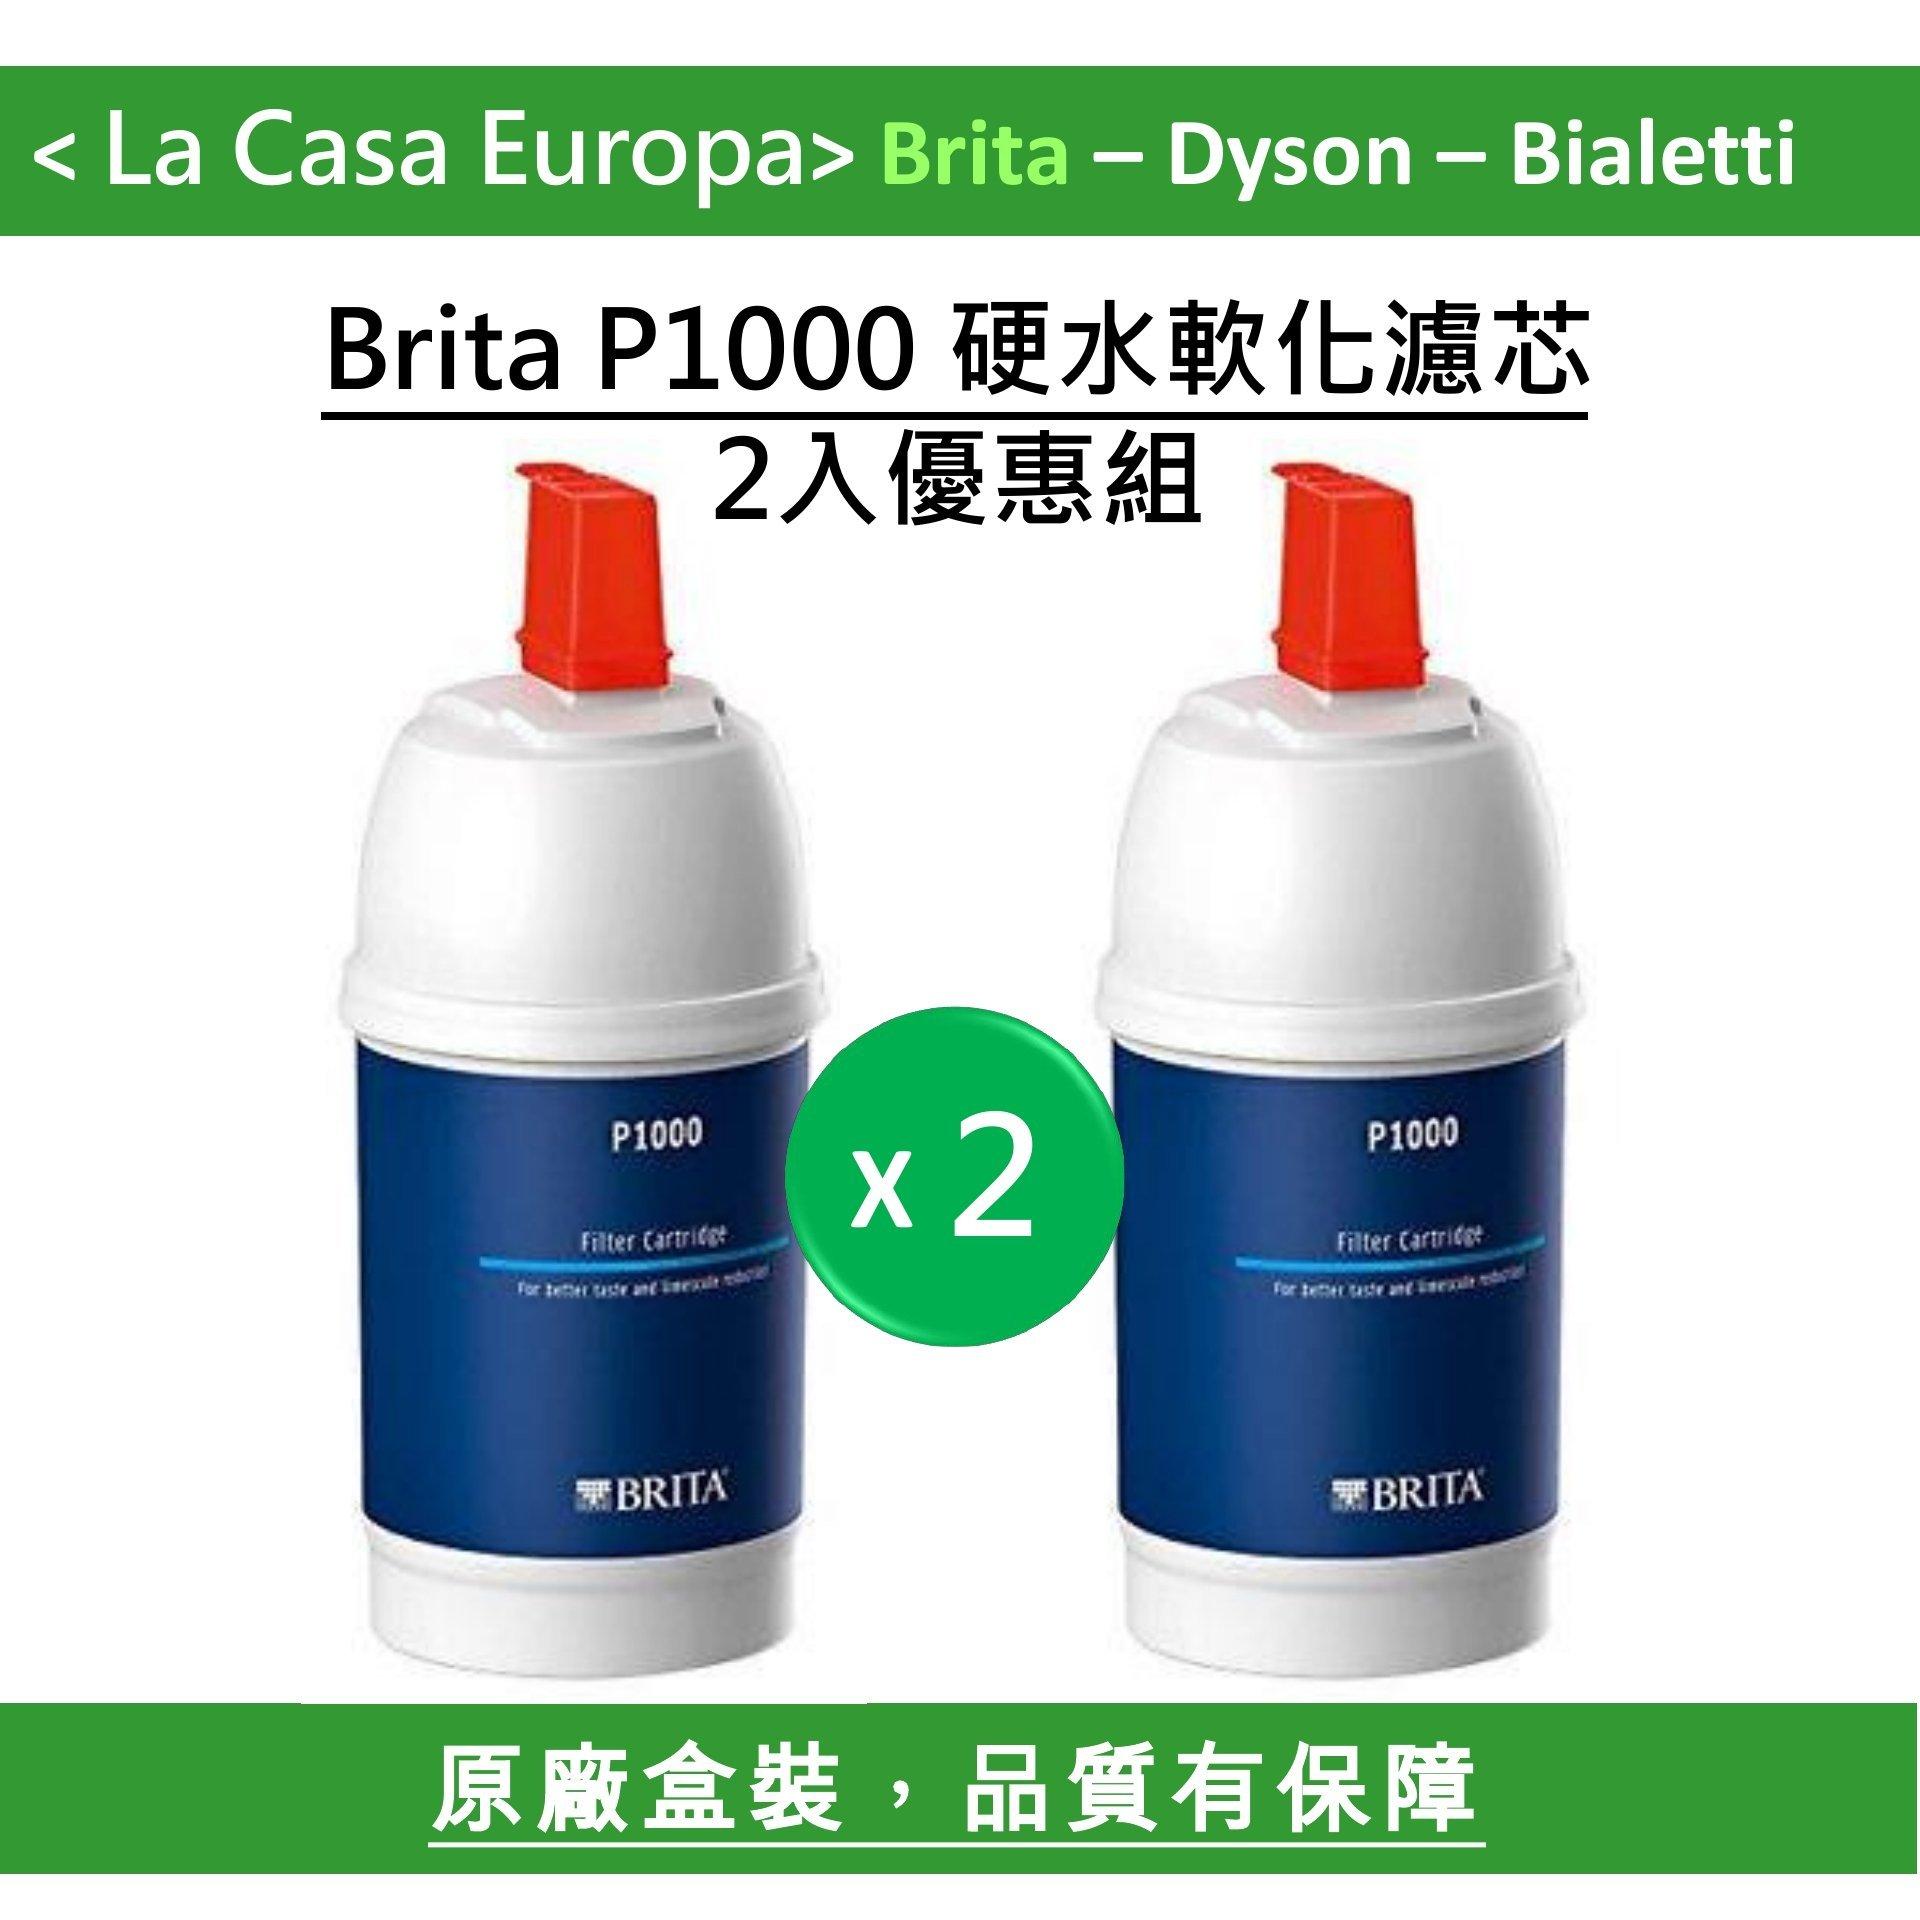 [My Brita] 2入P1000硬水軟化櫥下型濾芯 濾心。新包裝。2018.12月 。 正貨。免 。